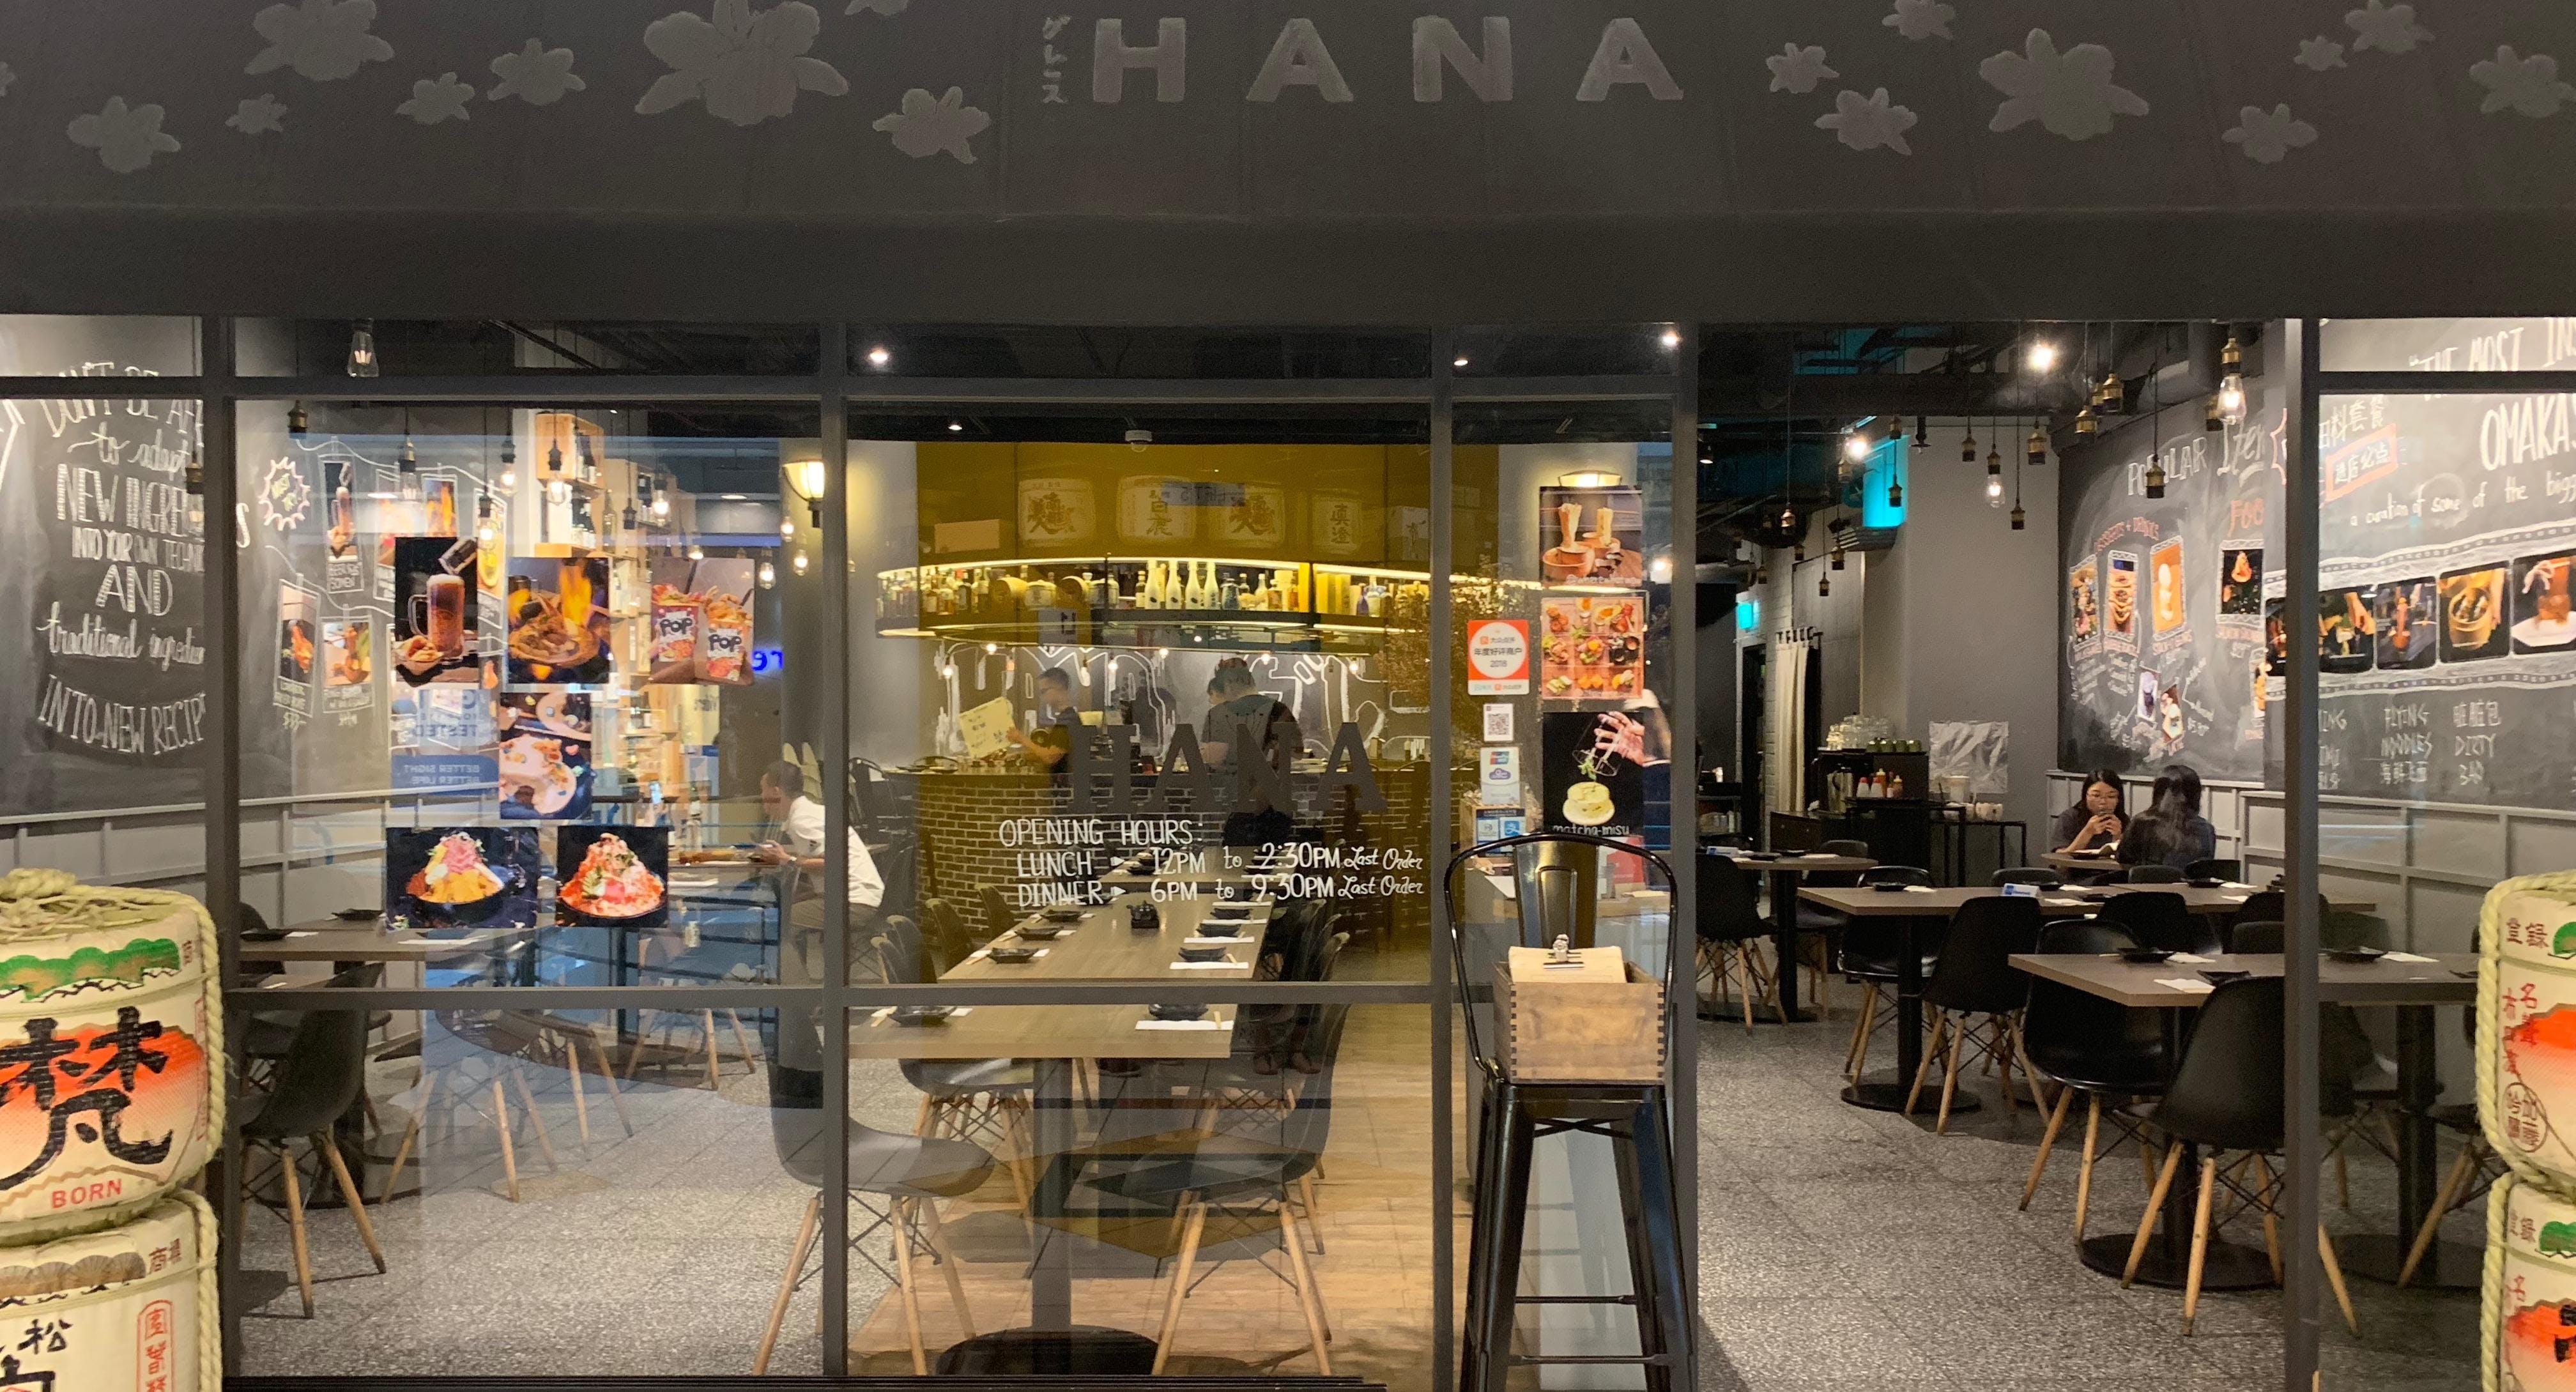 Hana Restaurant Singapore image 2